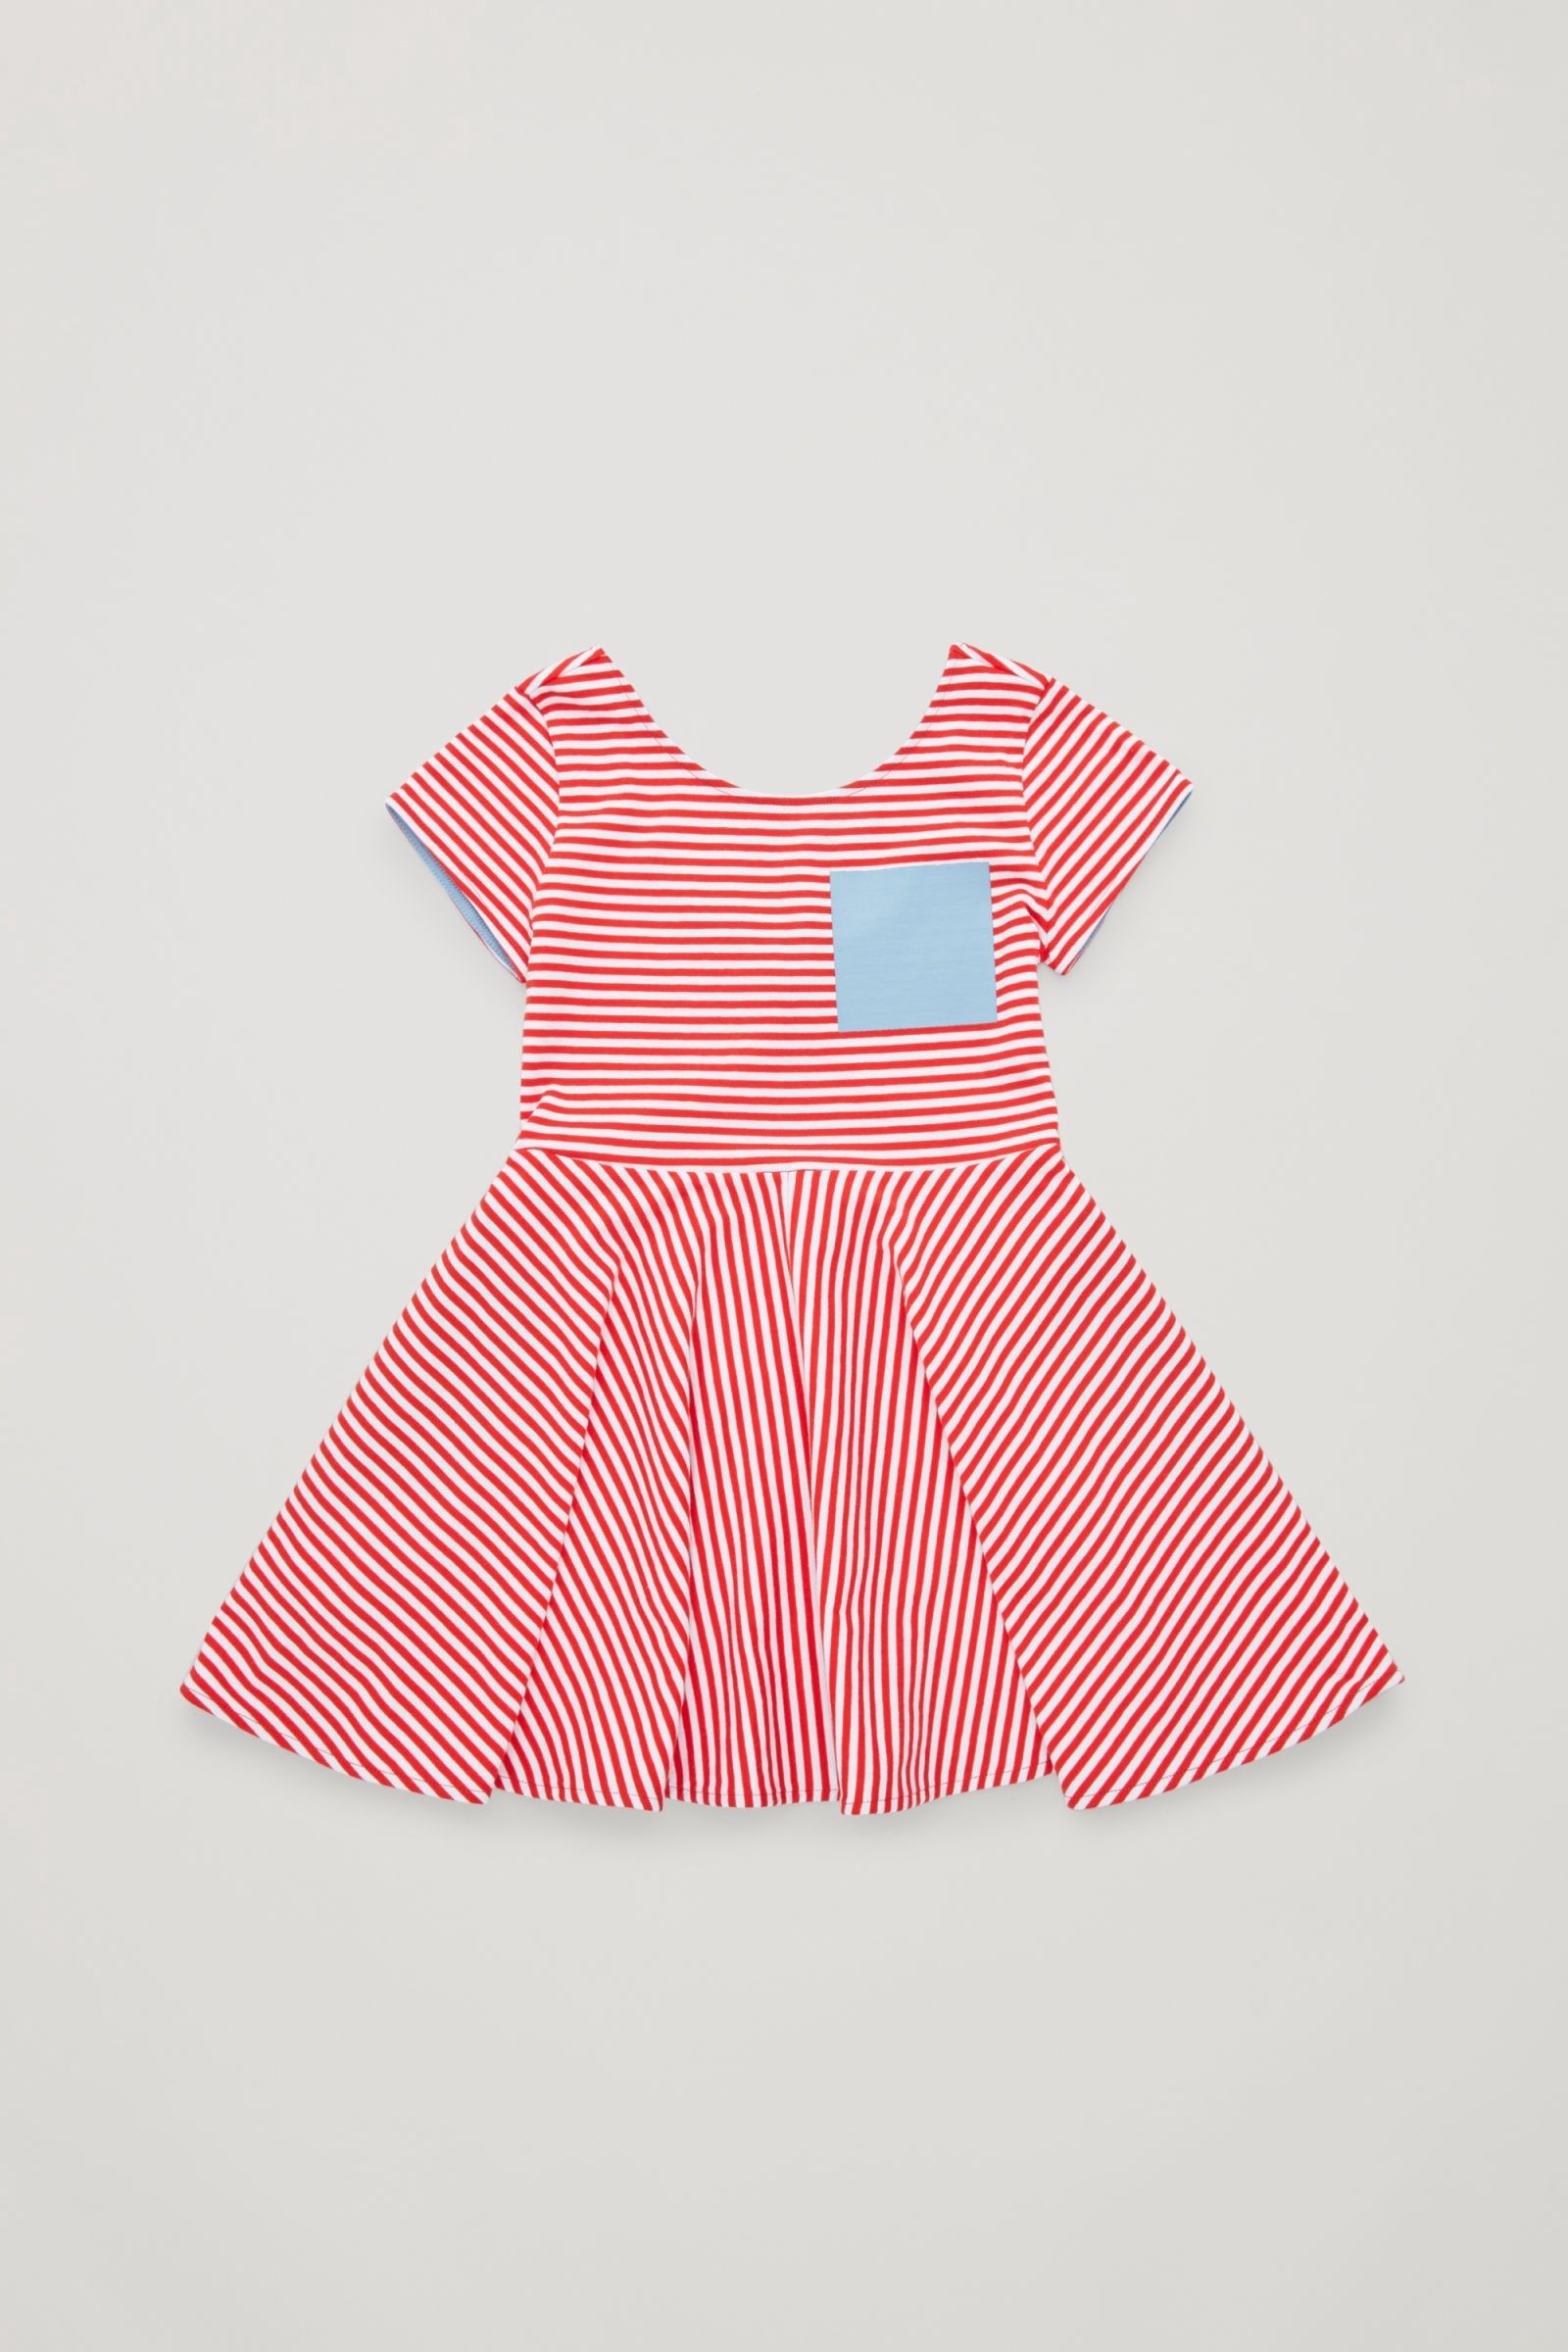 5f0d6370255a Cos Striped Cotton Dress - Red   White Pale Blue 4-6Y